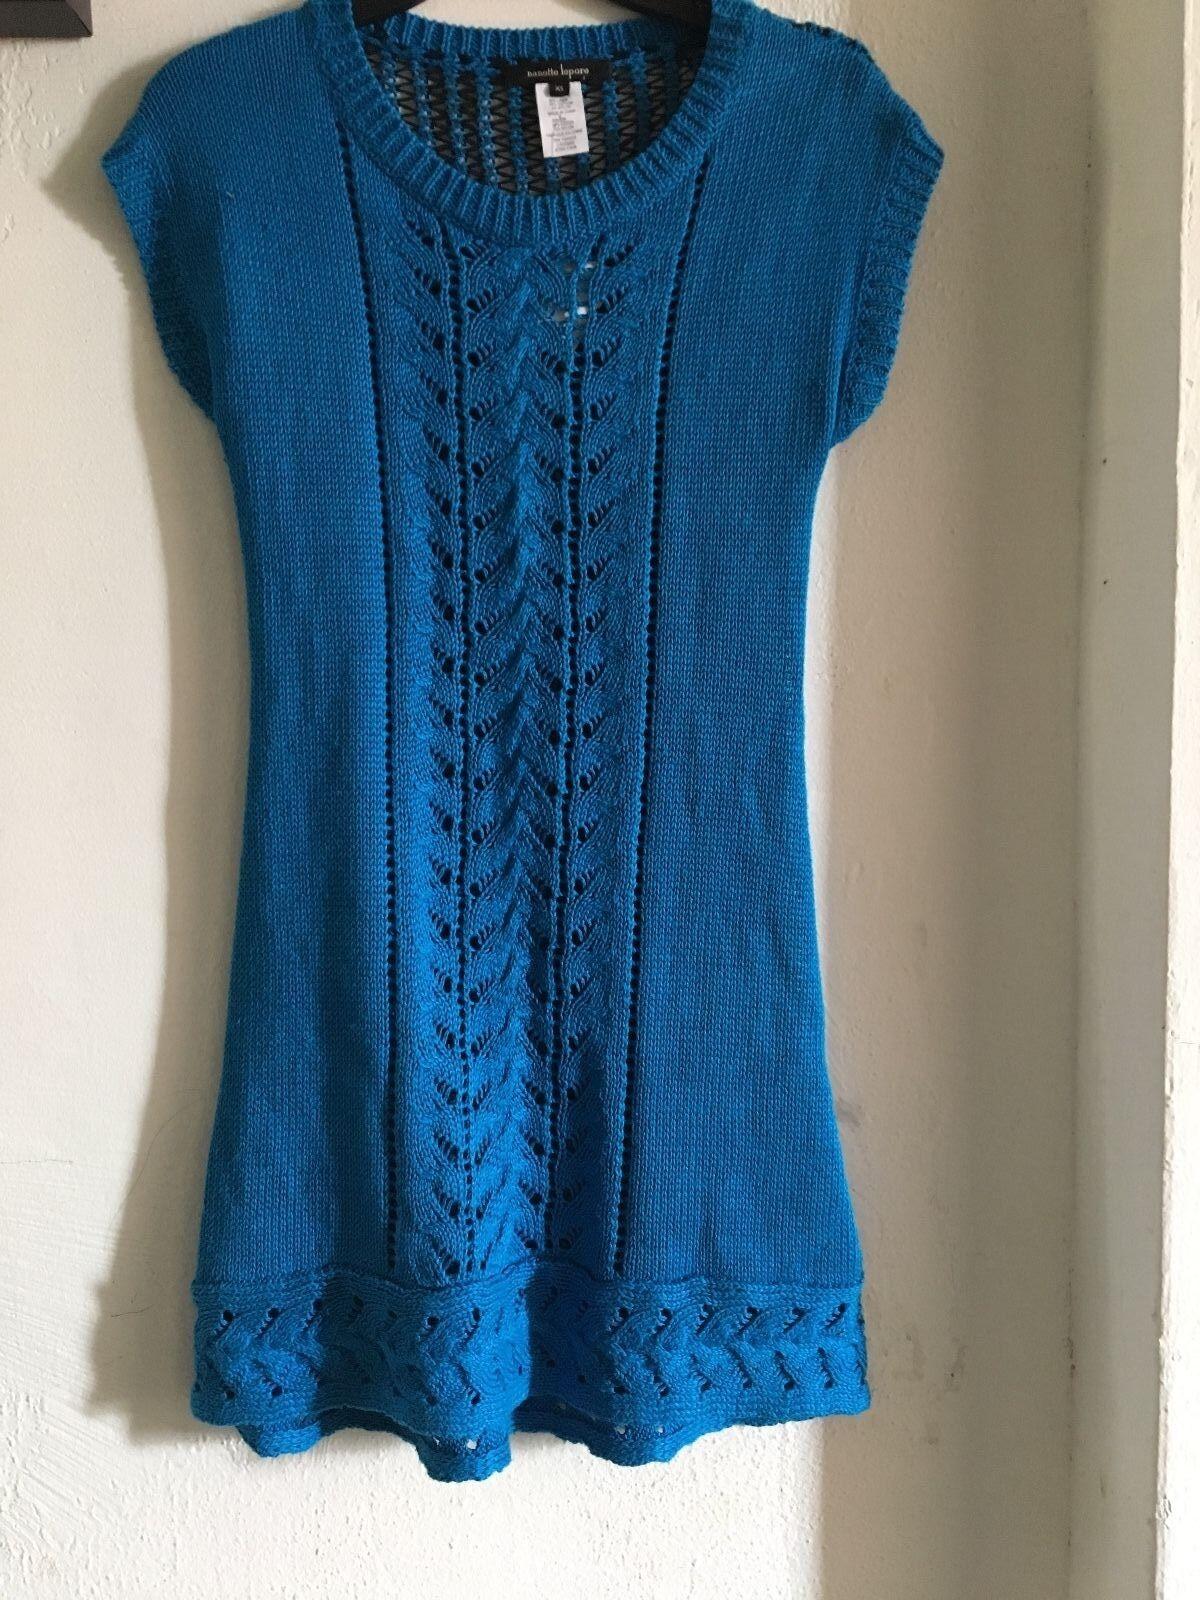 Nanette Lepore sweater Dress sz XS bluee